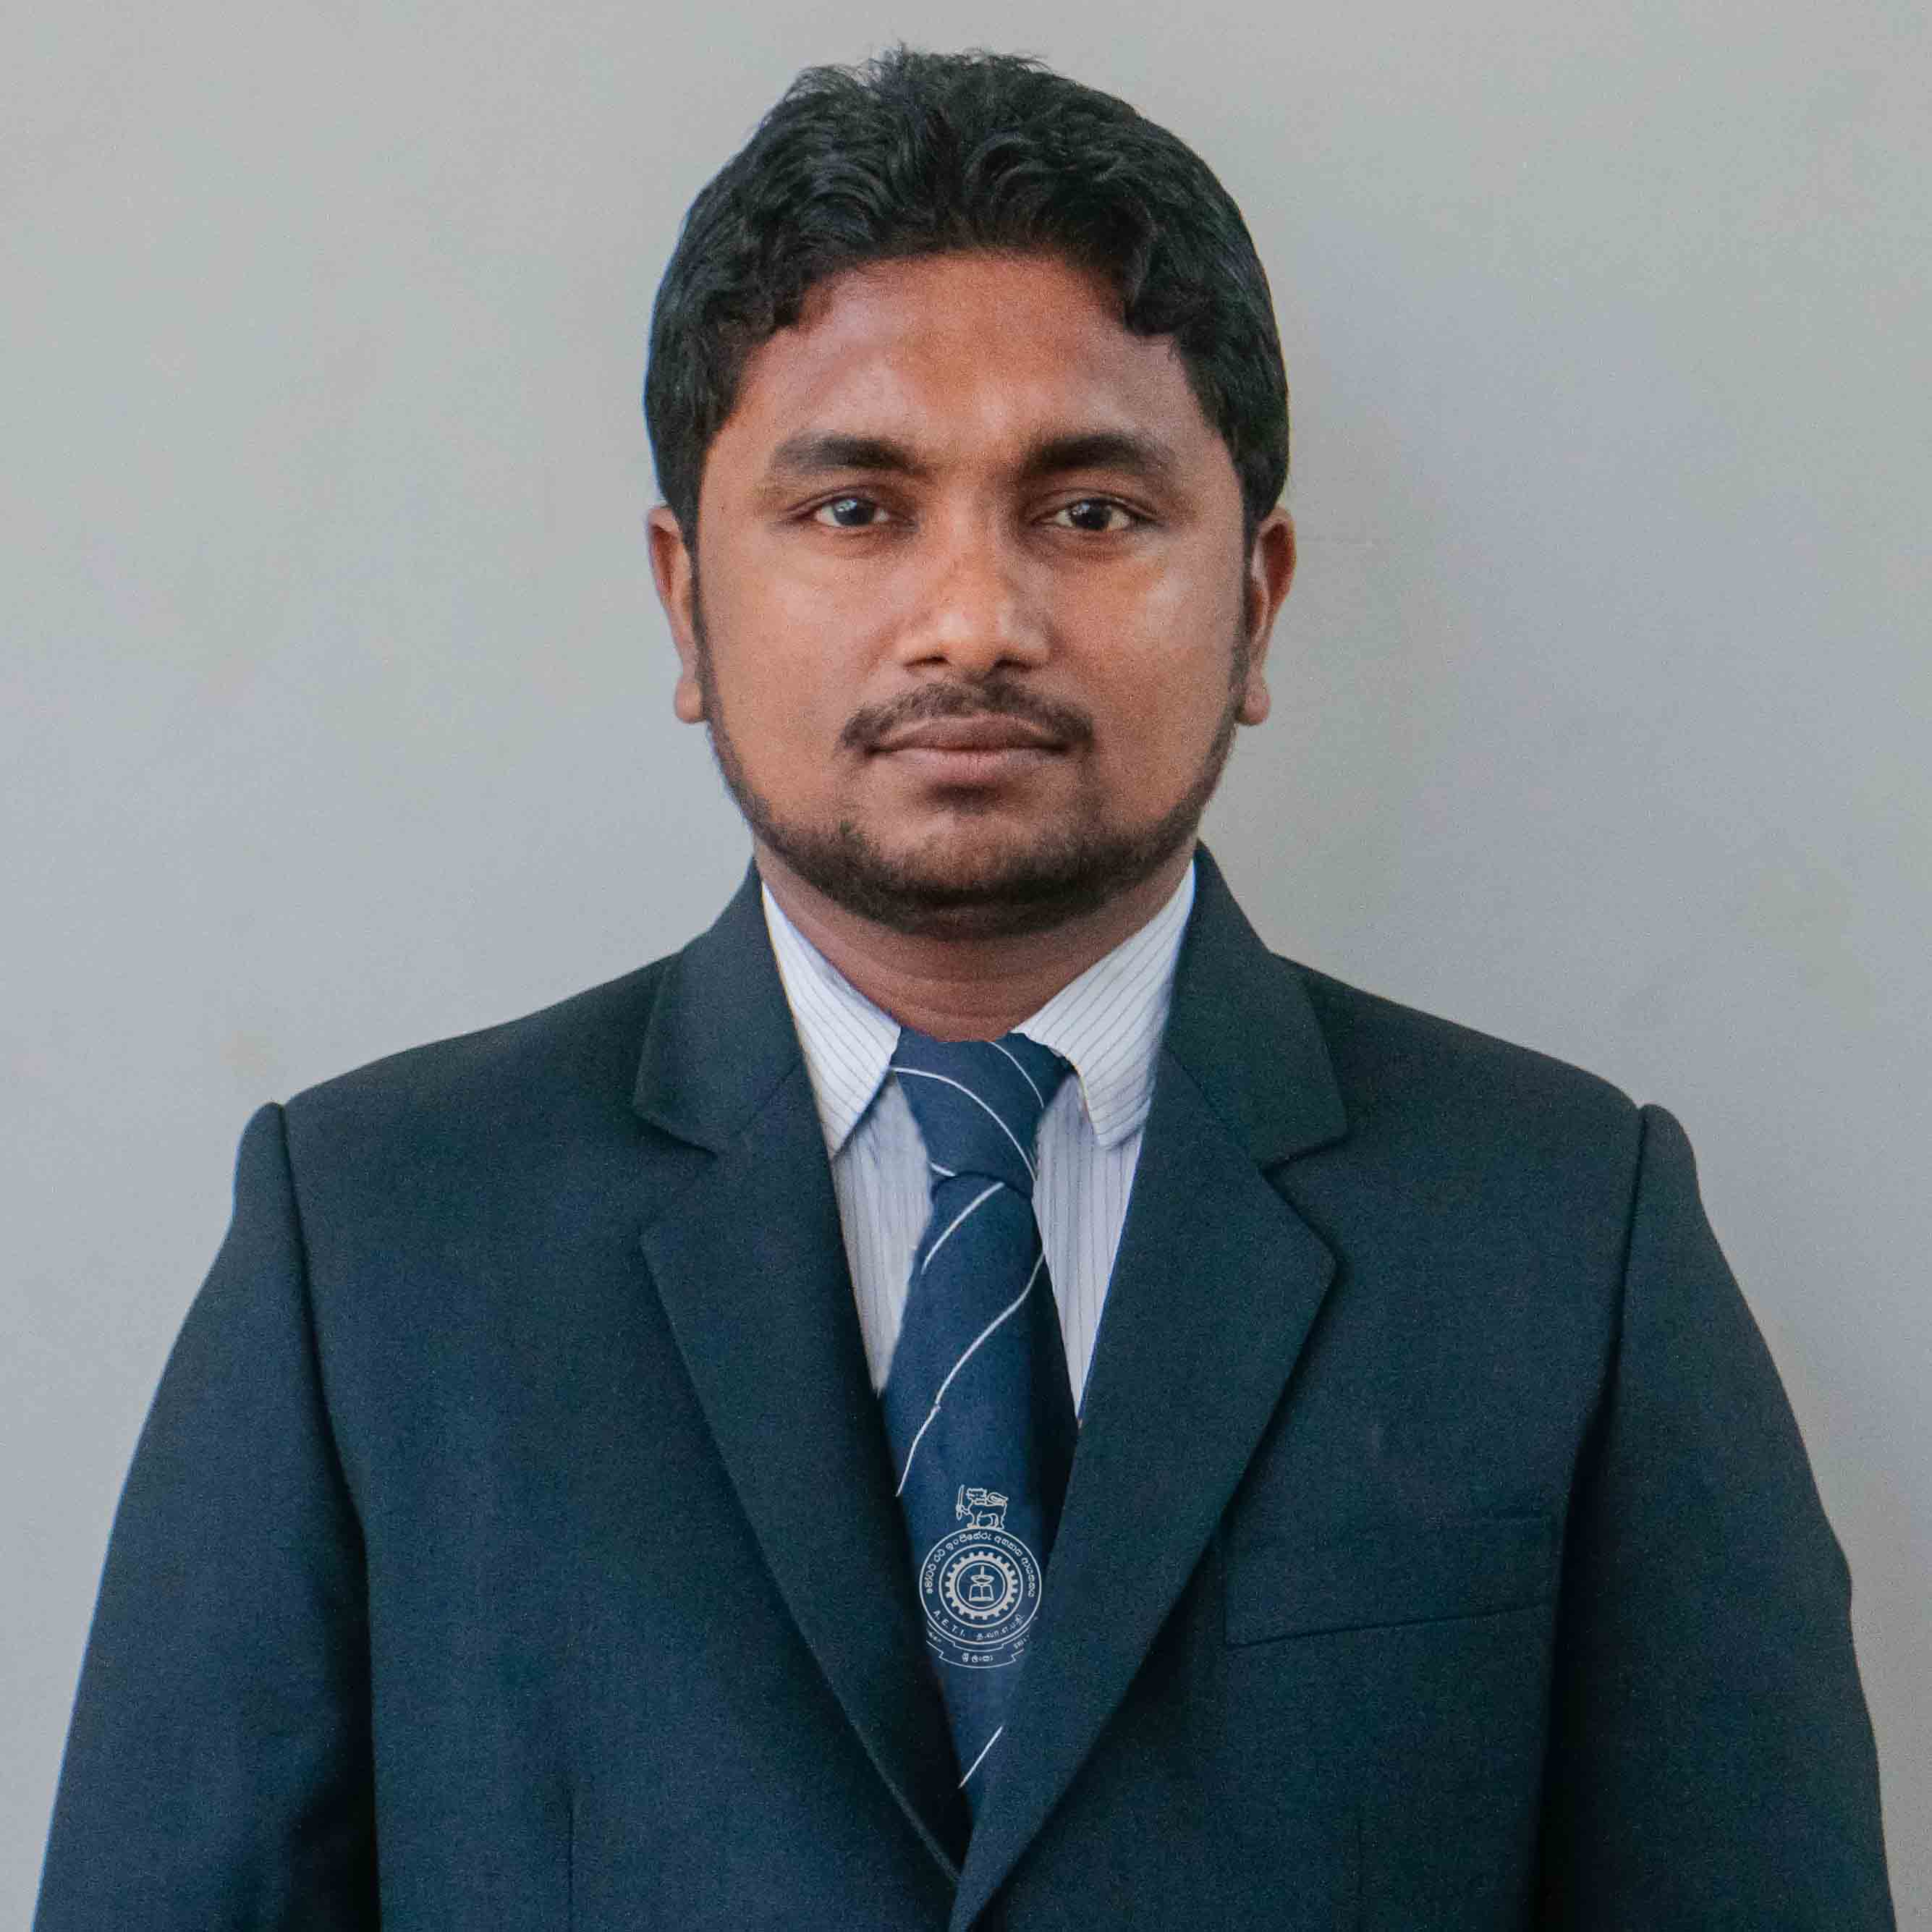 Mr. J.P. Kasthuriarachchi